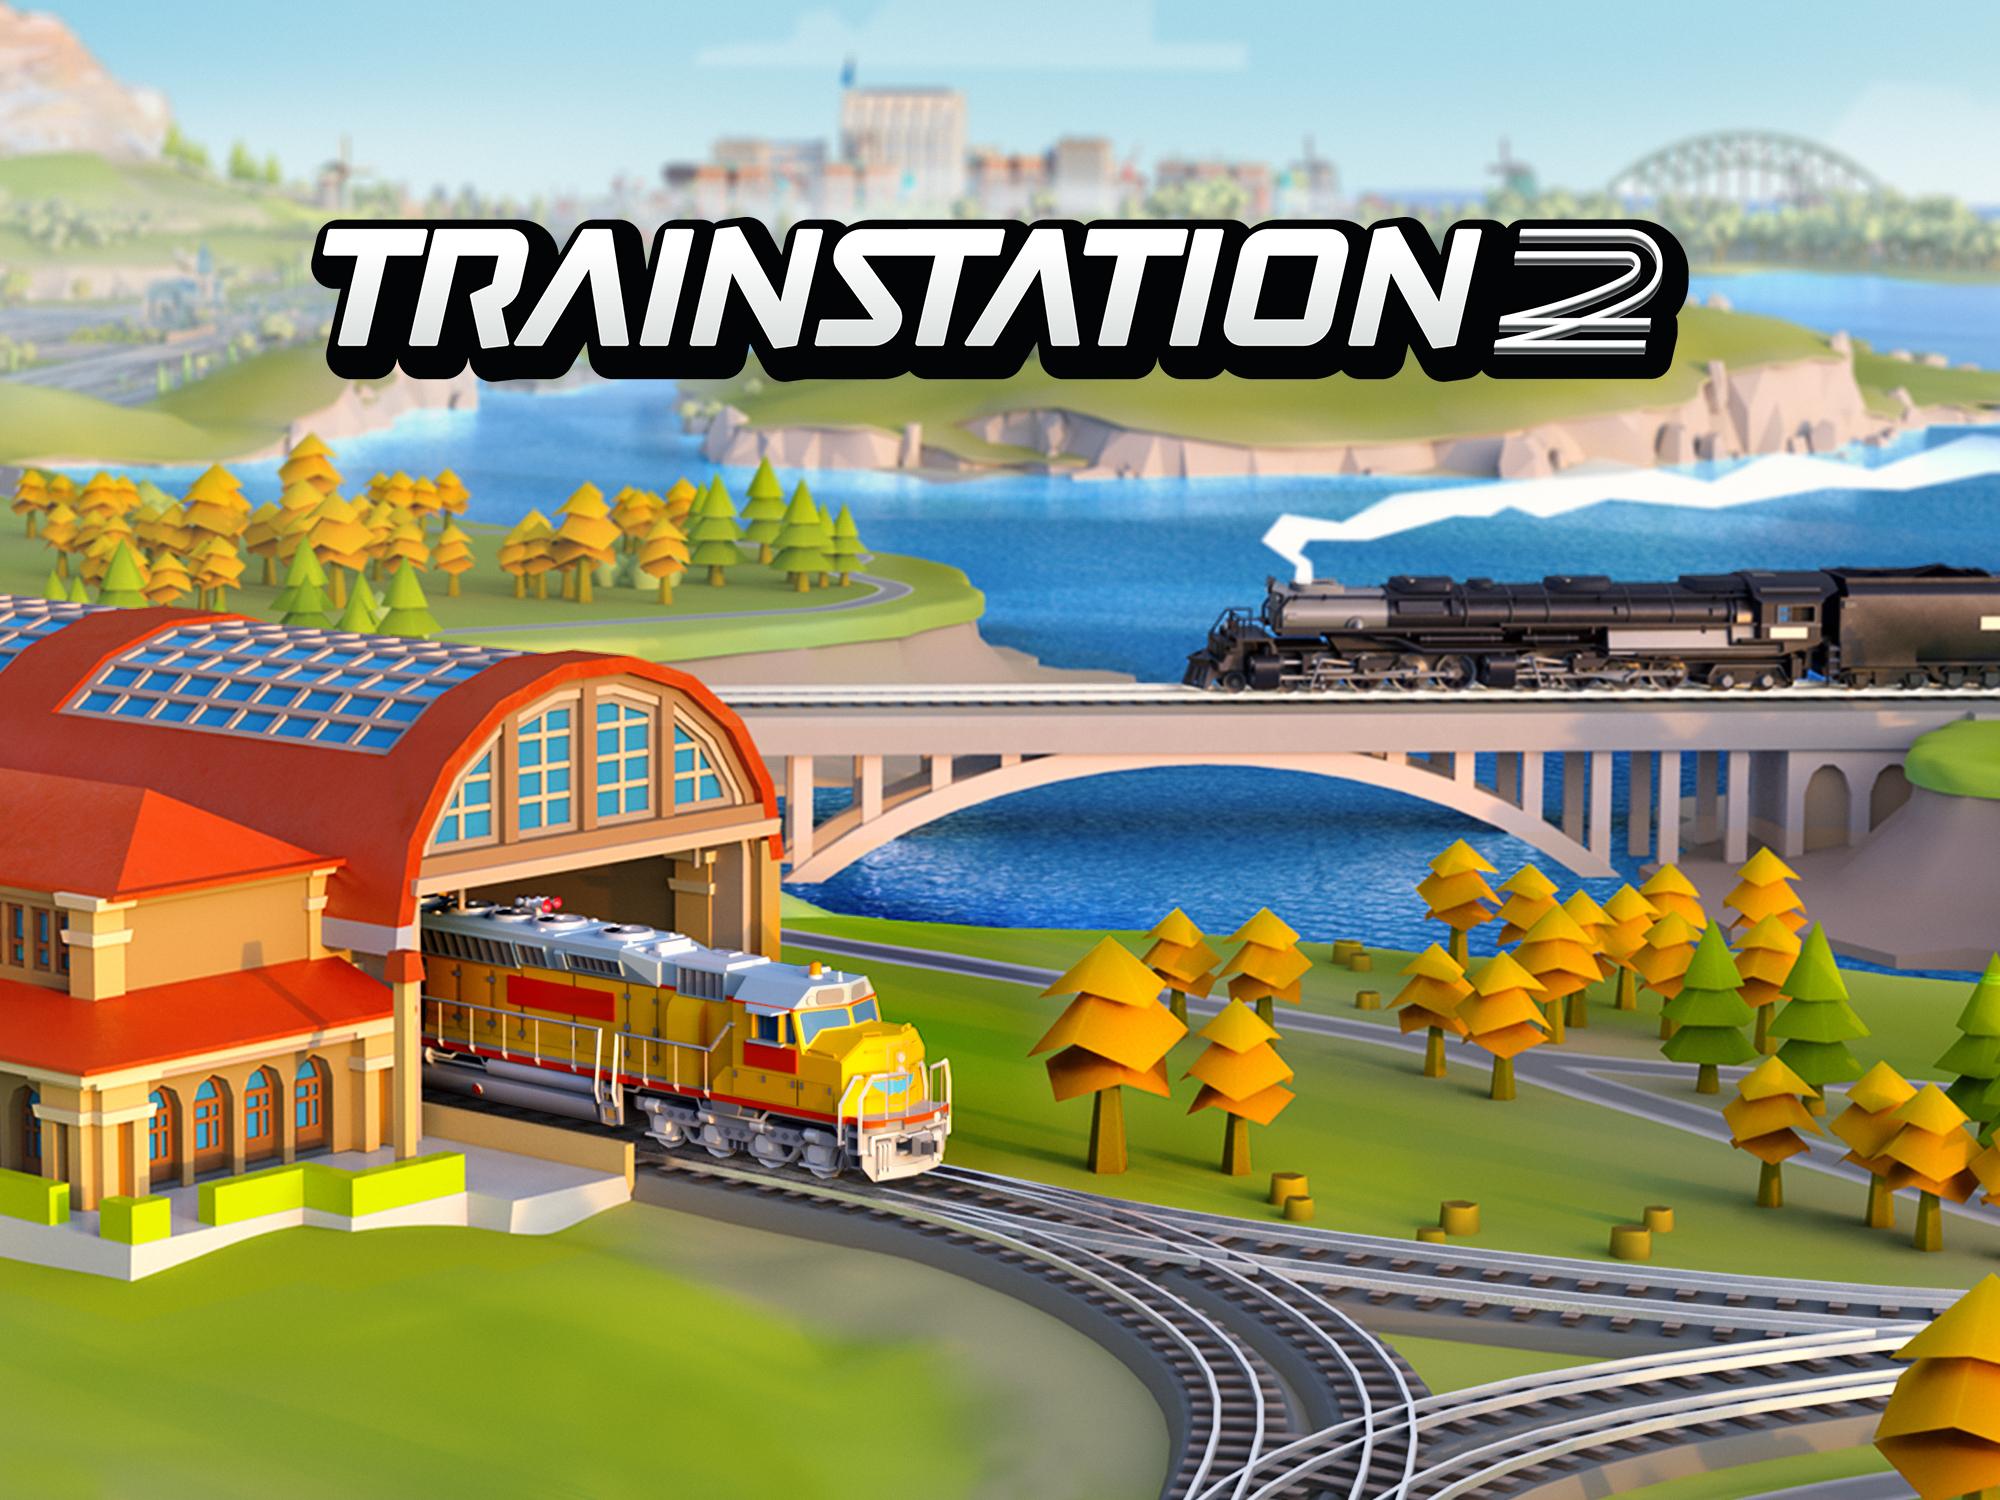 TrainStation 2 - Pixel Federation Games